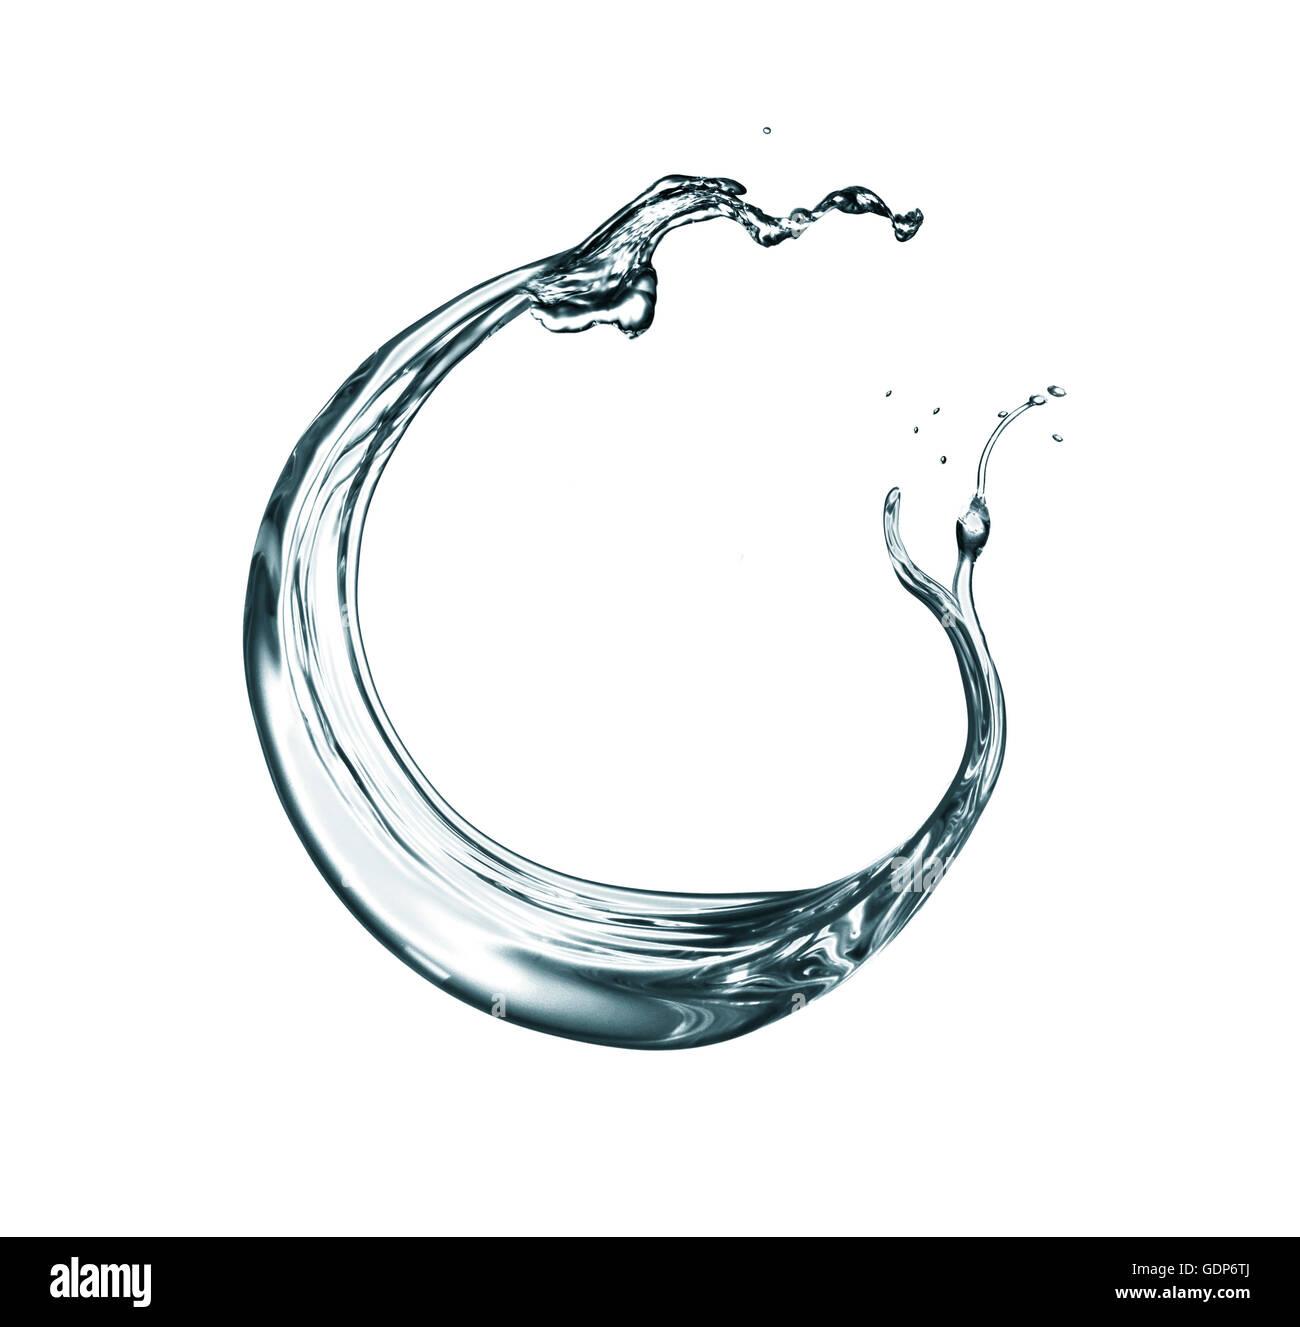 Transparent liquid swirling against white background - Stock Image